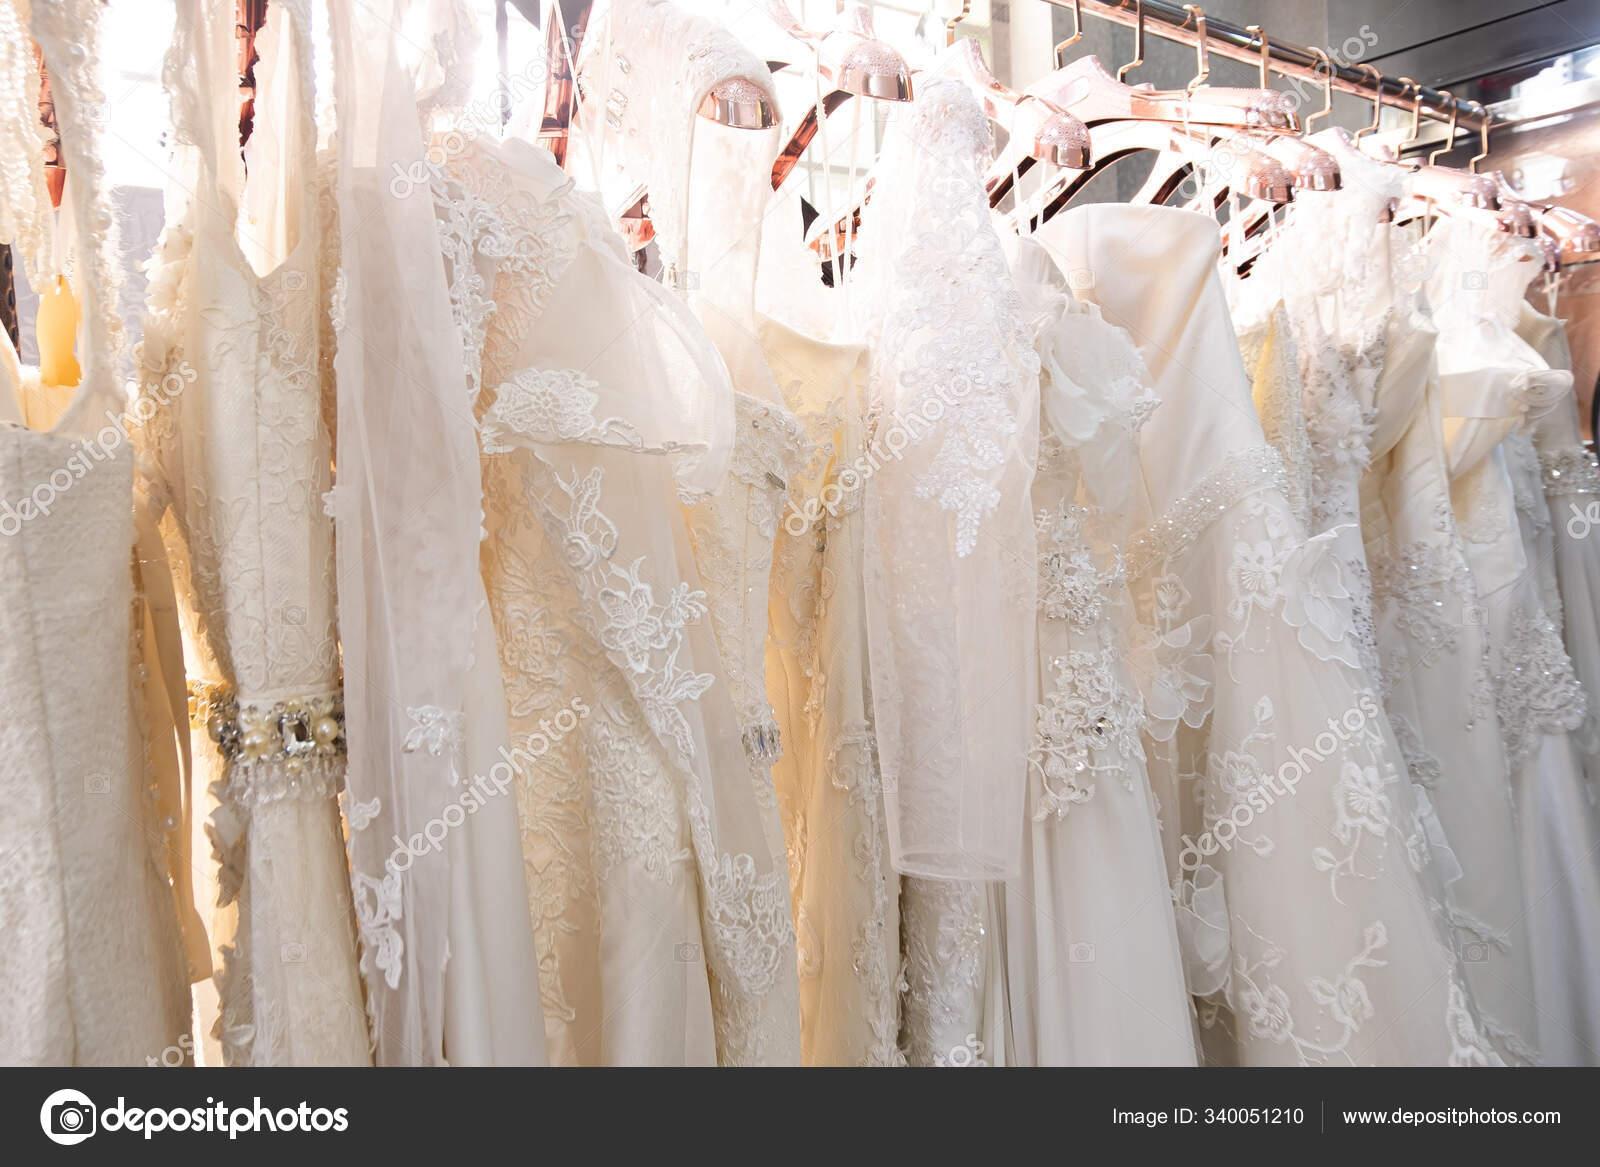 Beautiful White Bridal Dress Texture Background Wedding Dresses Hanging Hanger Stock Photo C Setthaphatdc415 Gmail Com 340051210